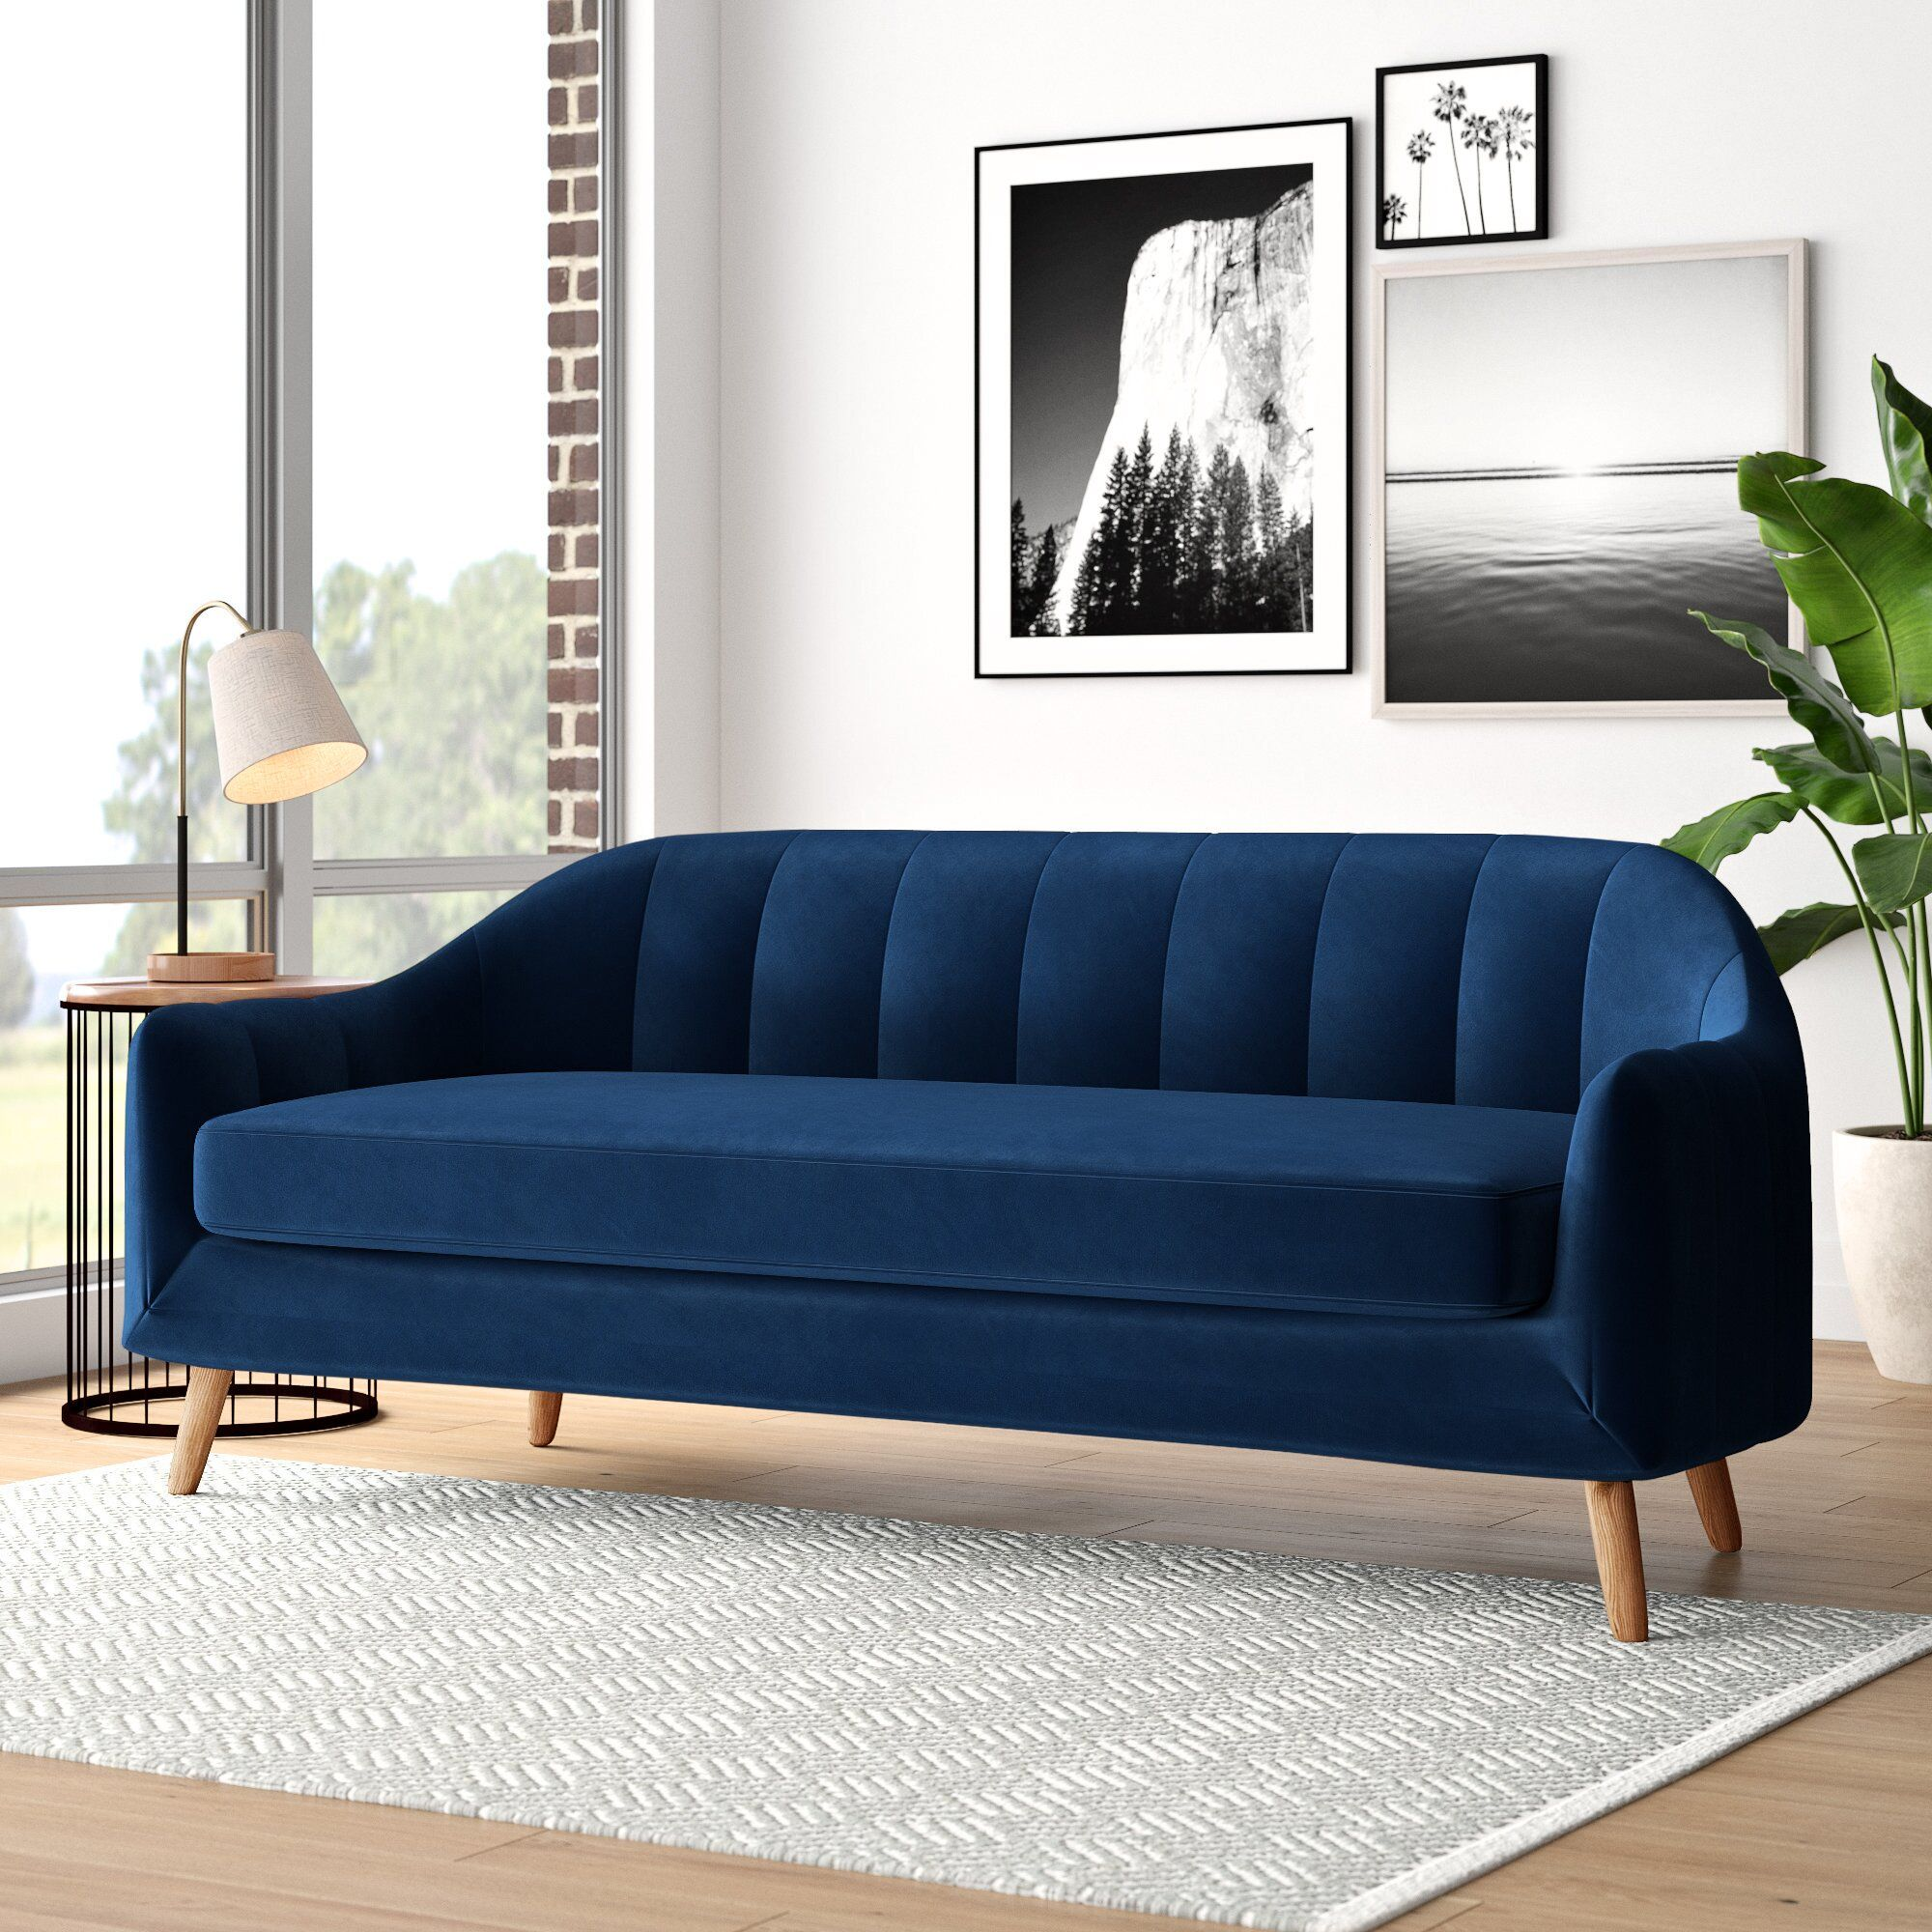 Desmond Sofa In 2020 Furniture Sofa Stylish Sofa